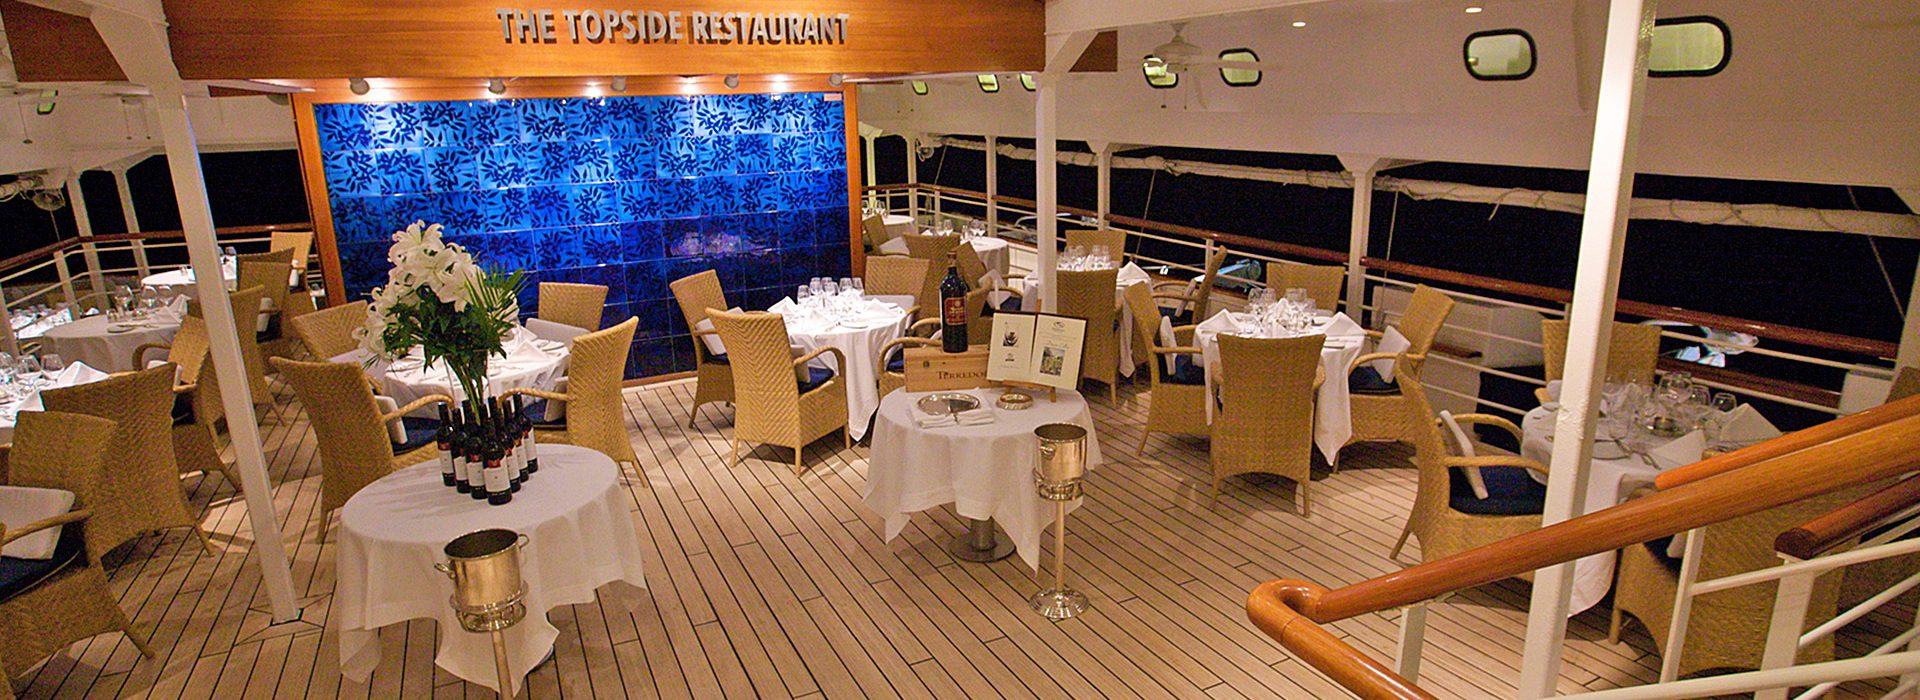 SeaDream_The_Topside_Restaurant